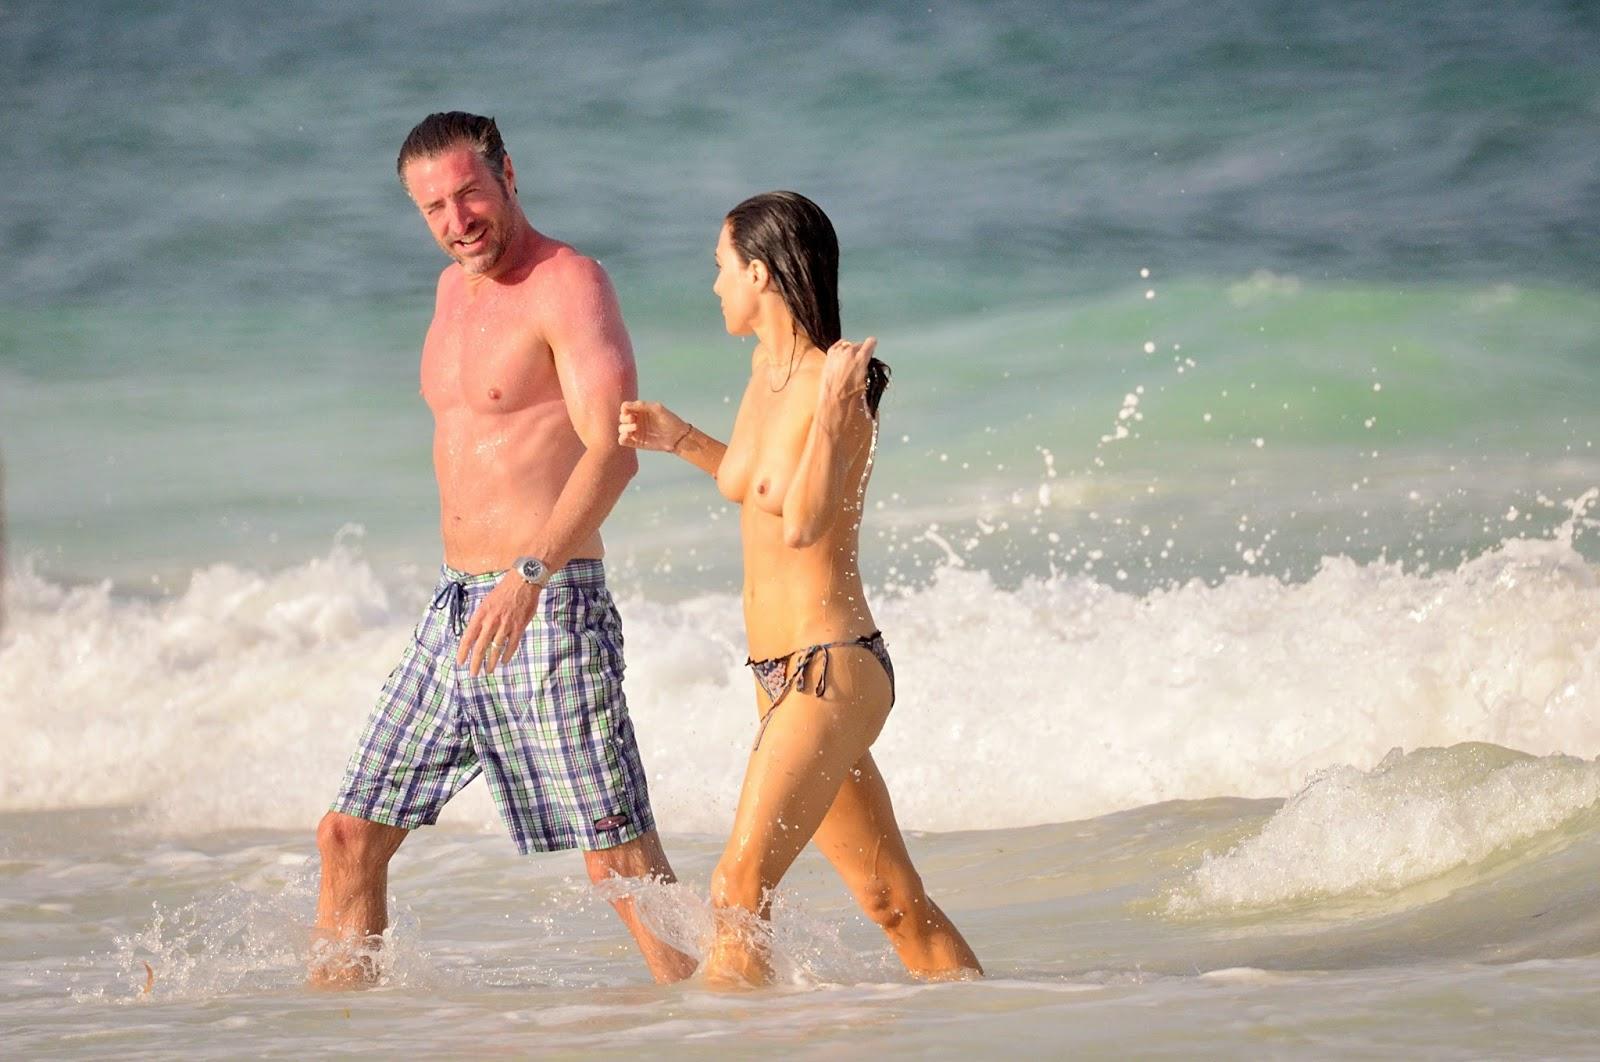 Jaime murray bikini ich